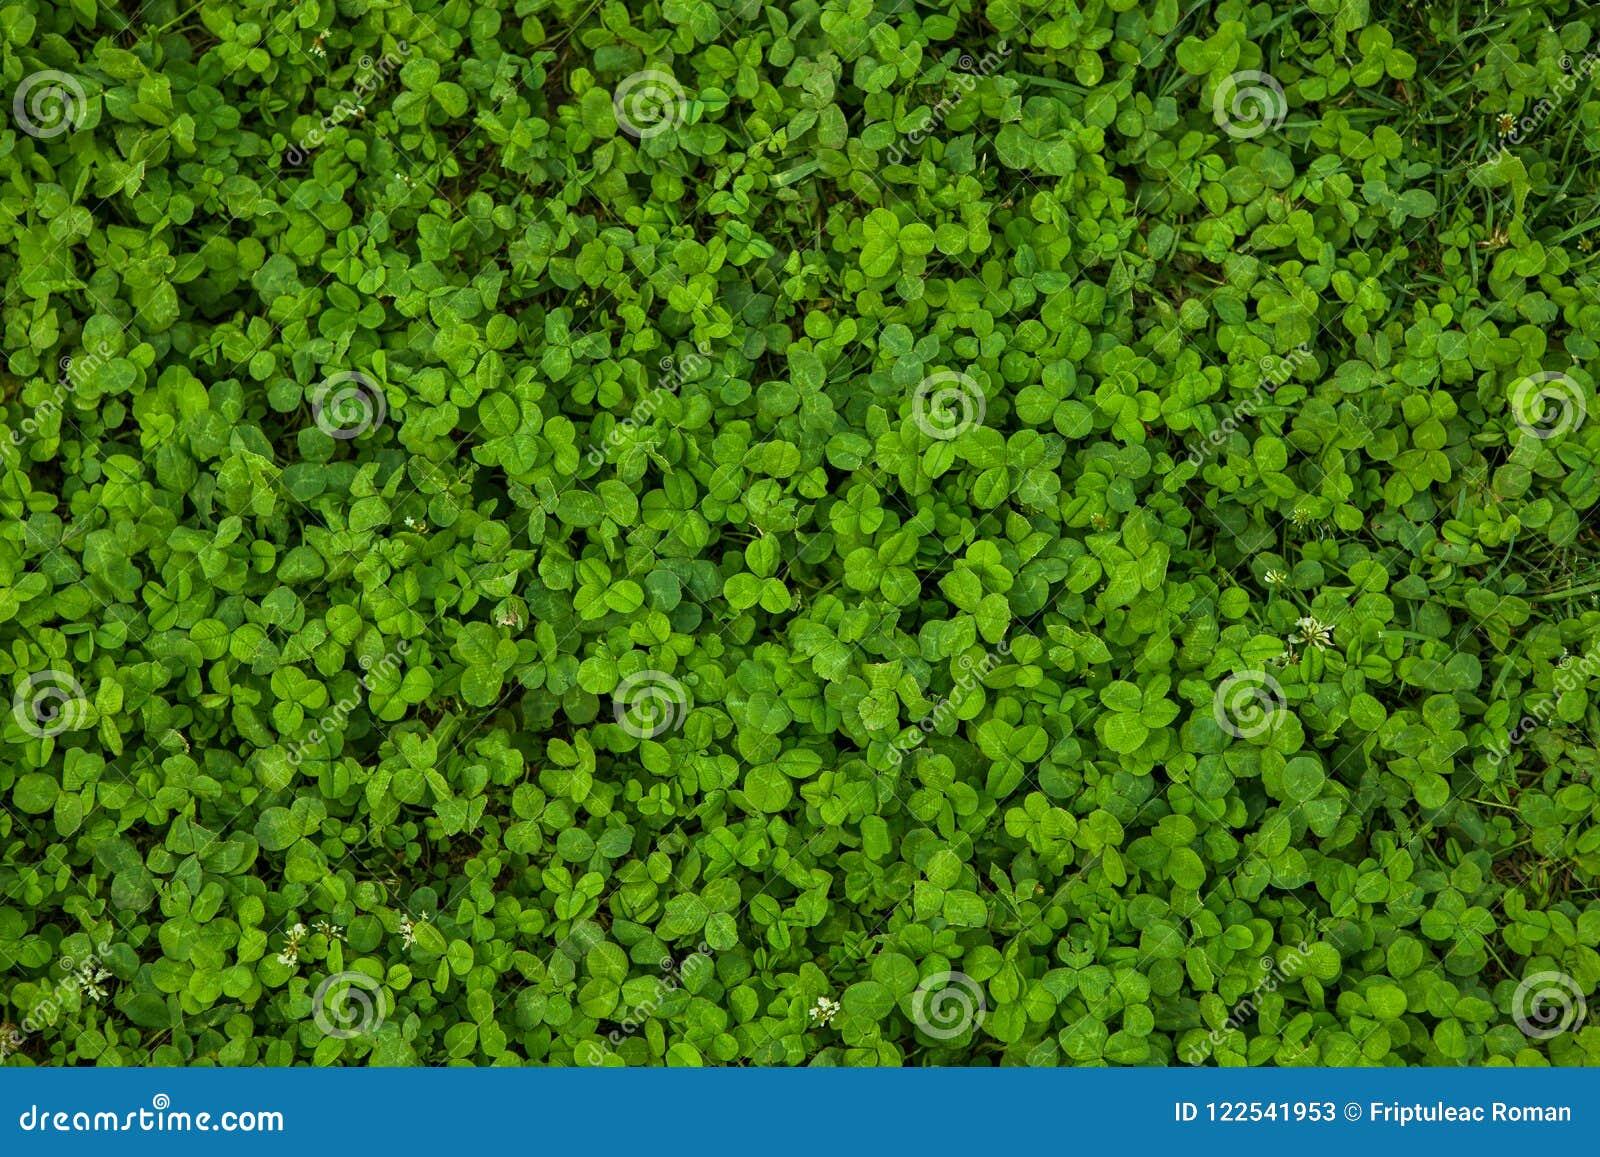 Mooie groene grastextuur